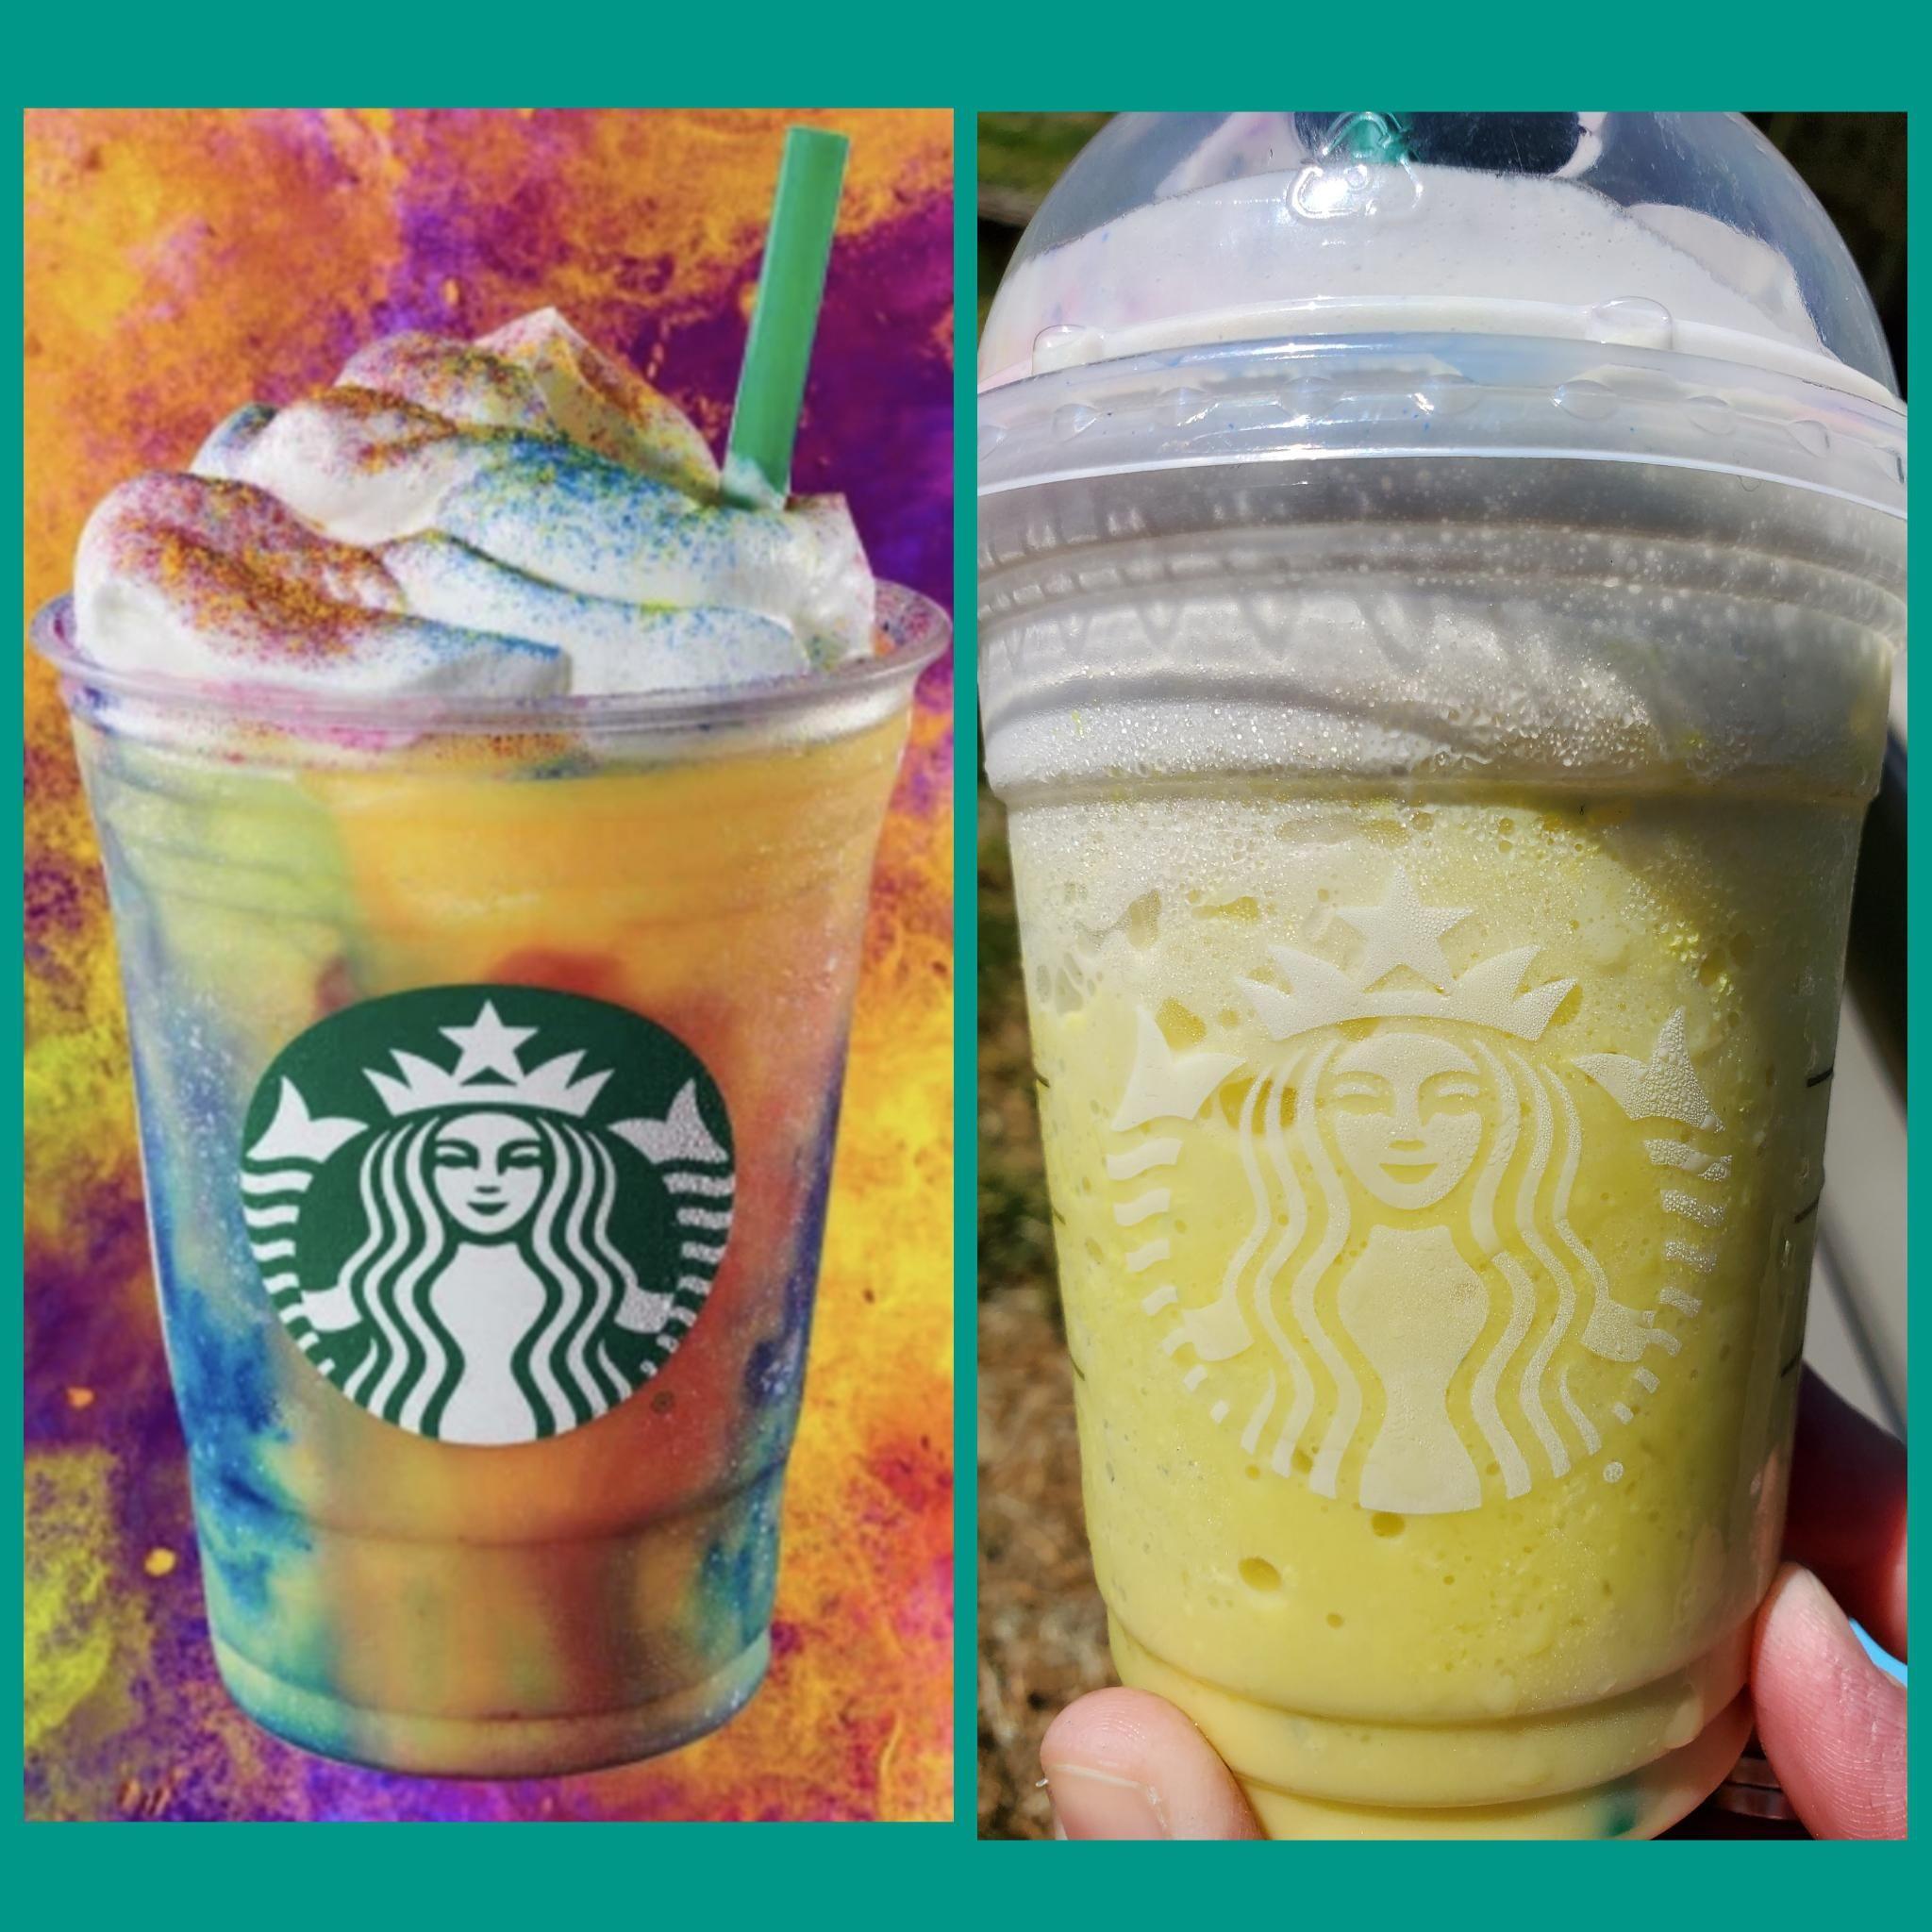 Starbucks tiedye frappuccino... 😂 Starbucks tiedye